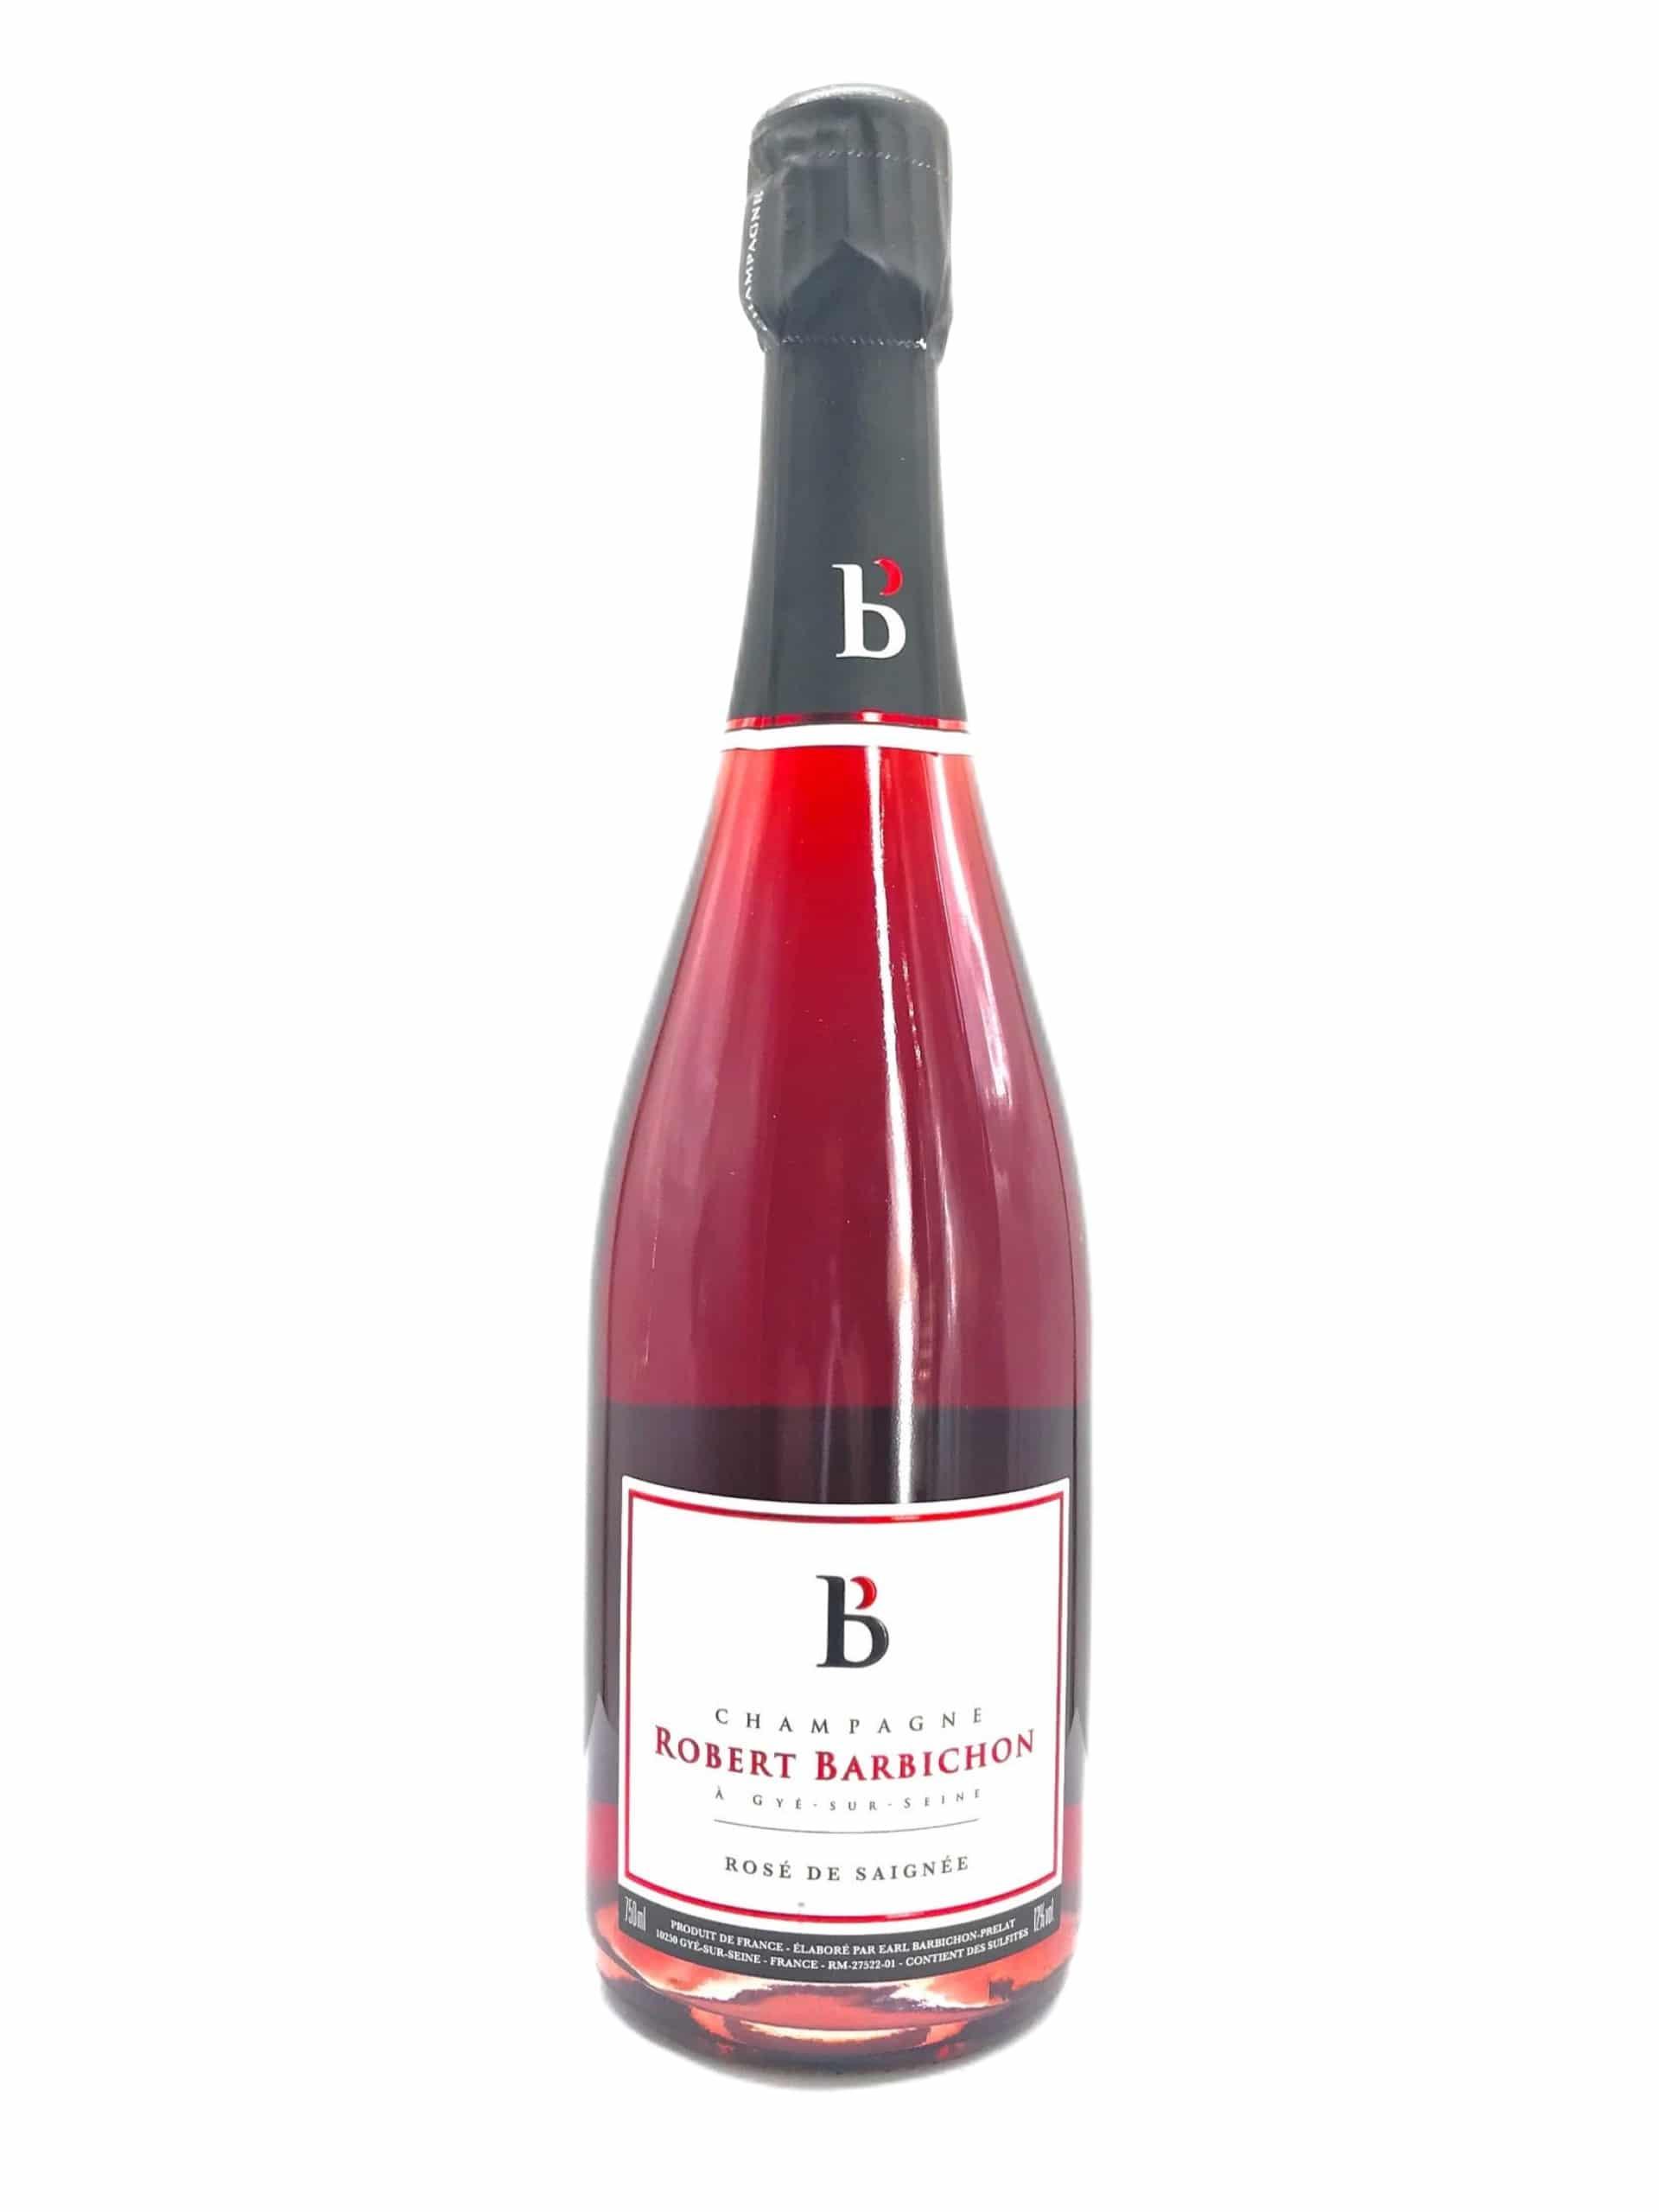 Champagne Robert Barbichon Rosé de Saignee